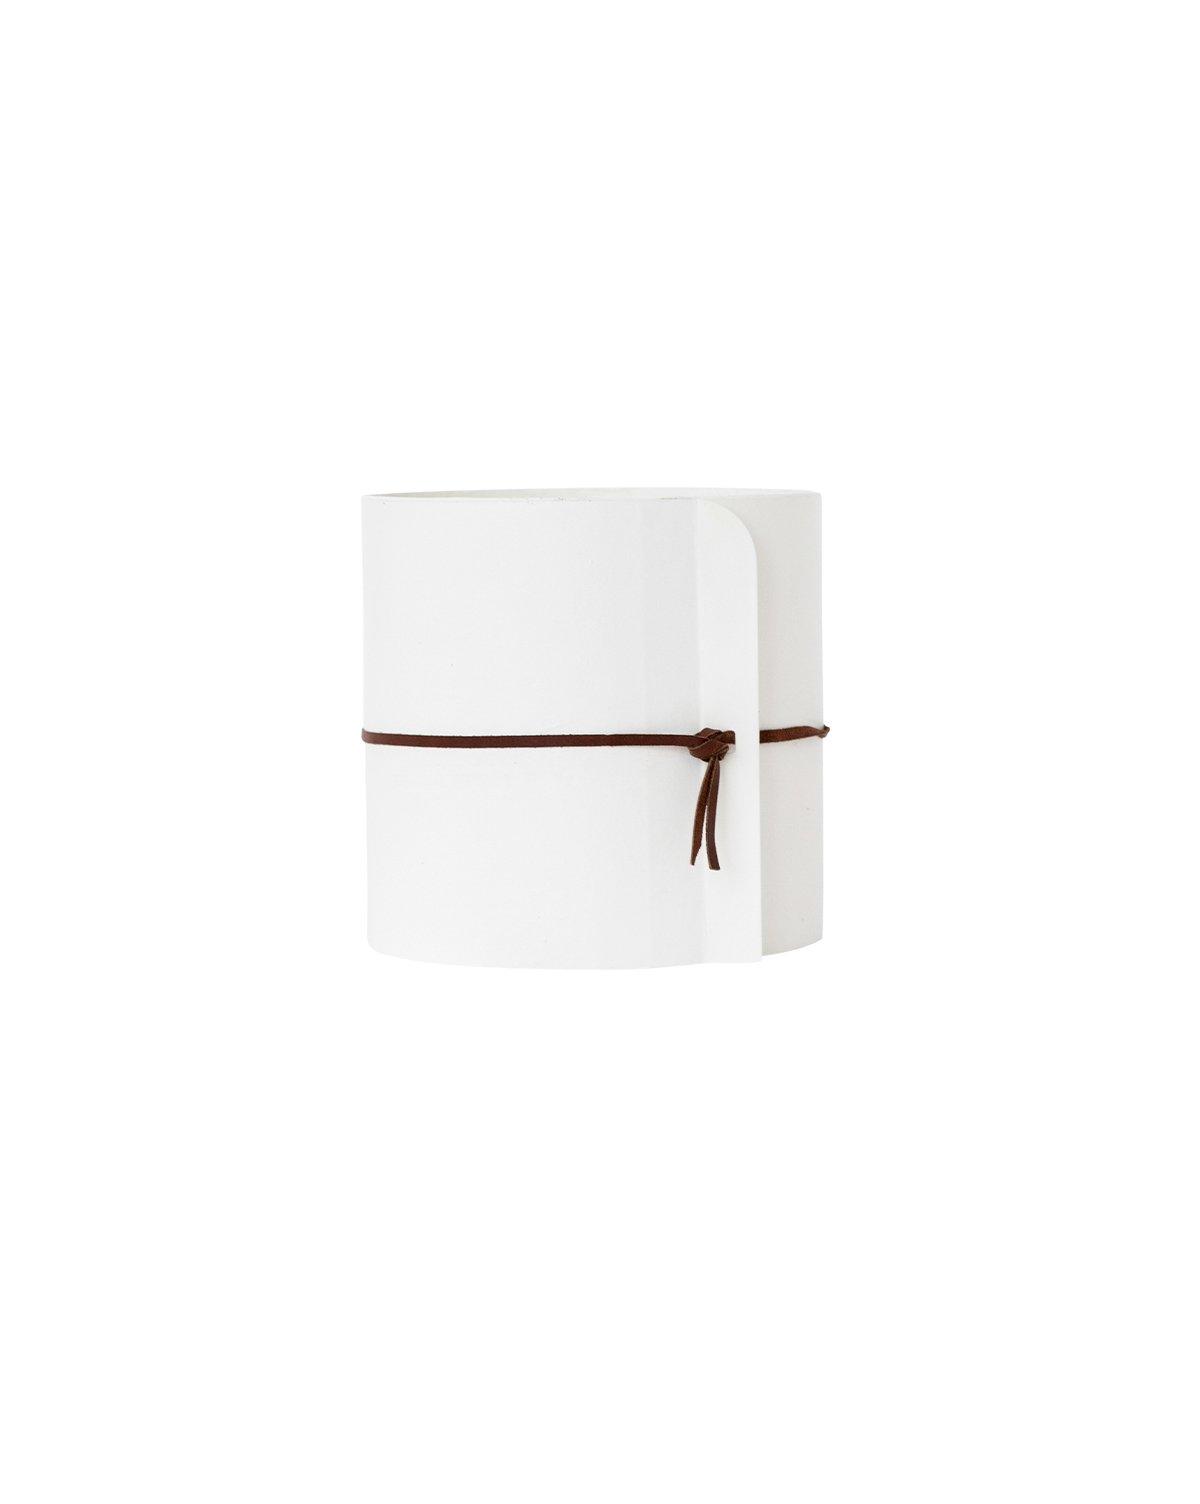 Recycled_Paper_Pot_white_1_7343c3c0-1c51-4010-bcc6-e129756f6691.jpg